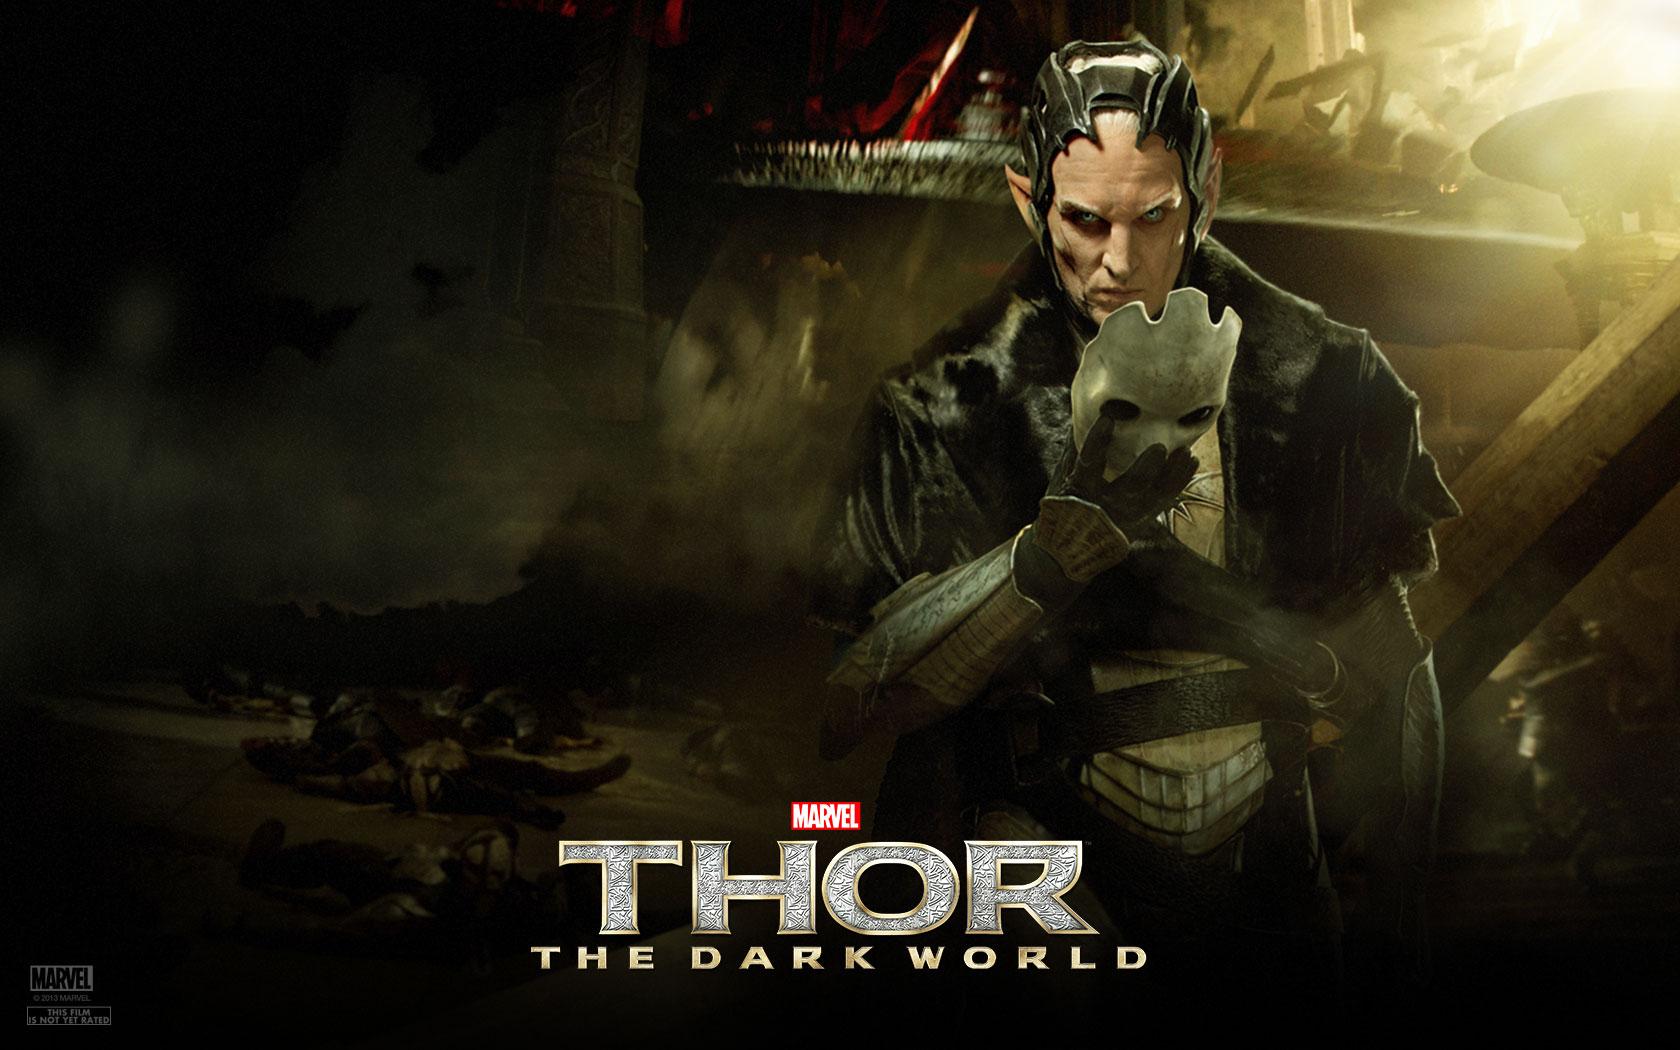 Thor The Dark World wallpaper 11